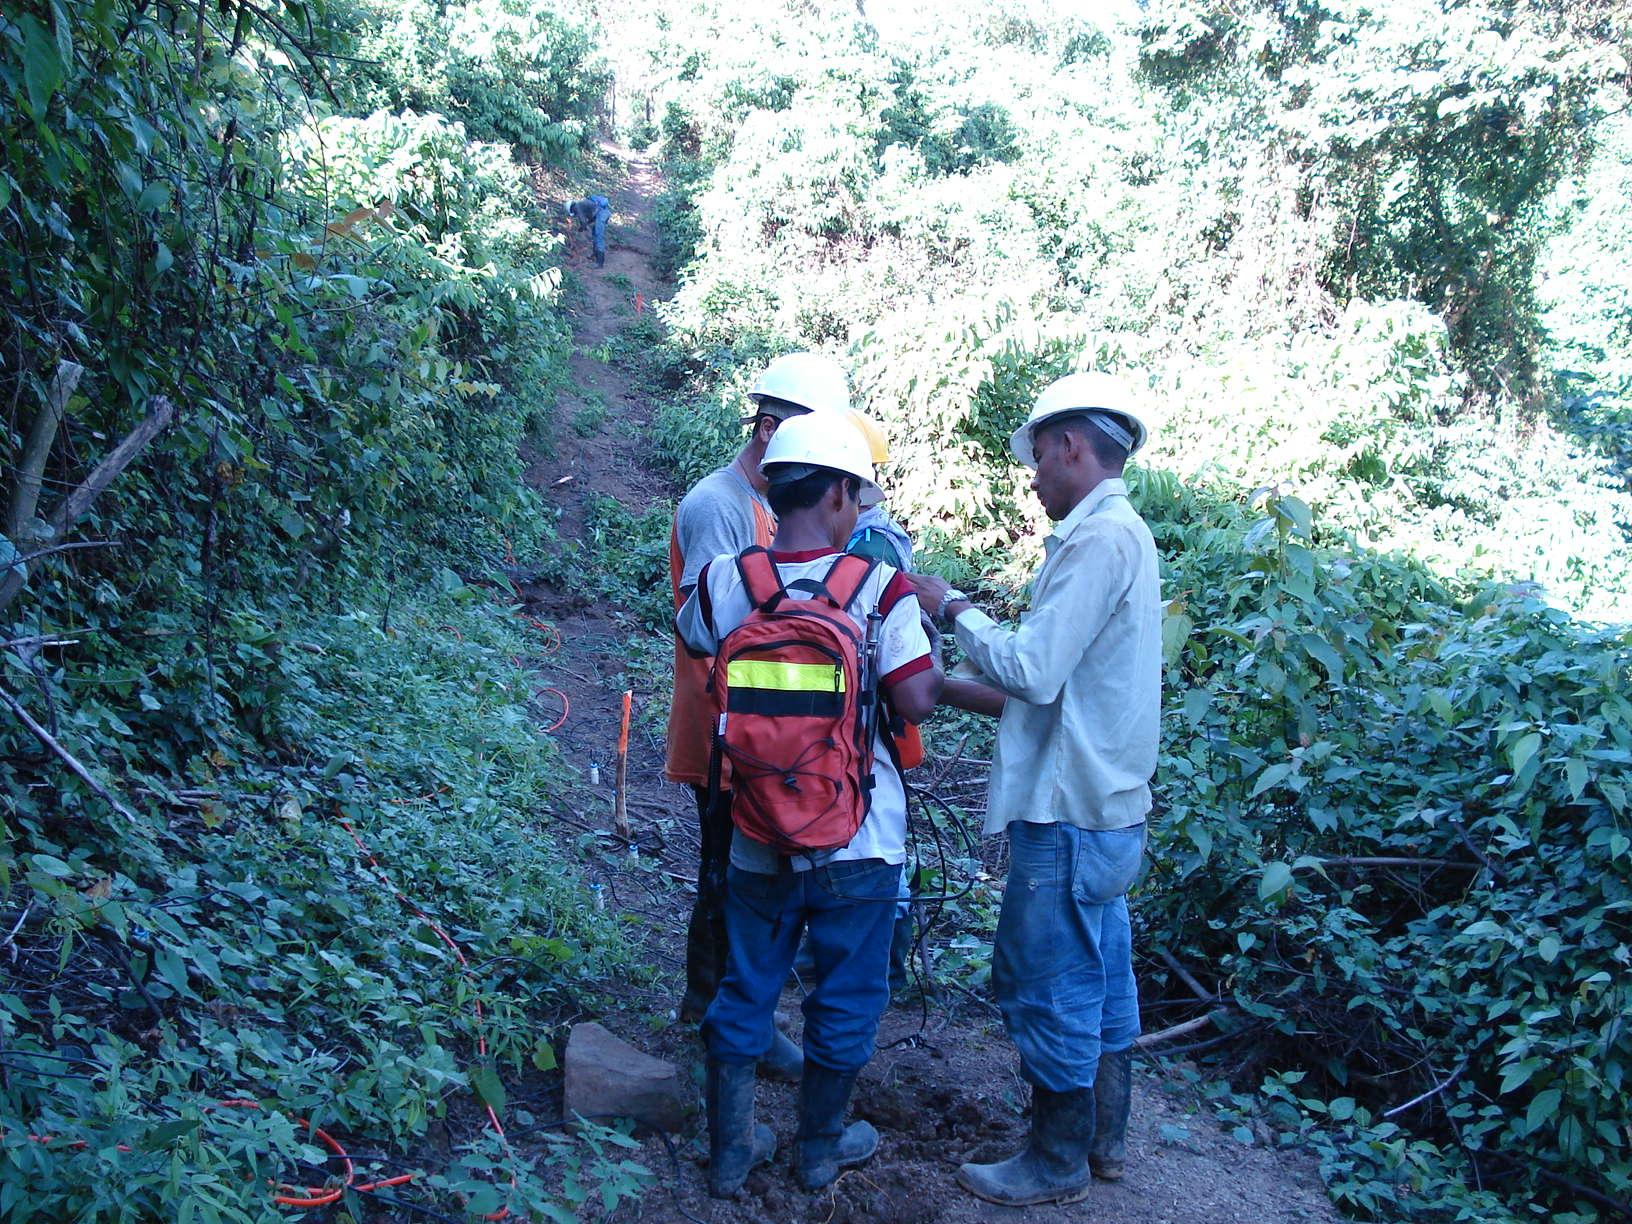 Seismic Acquisition - Petrolera Del Atlantico, A-7 Exploration Block, Guatemala